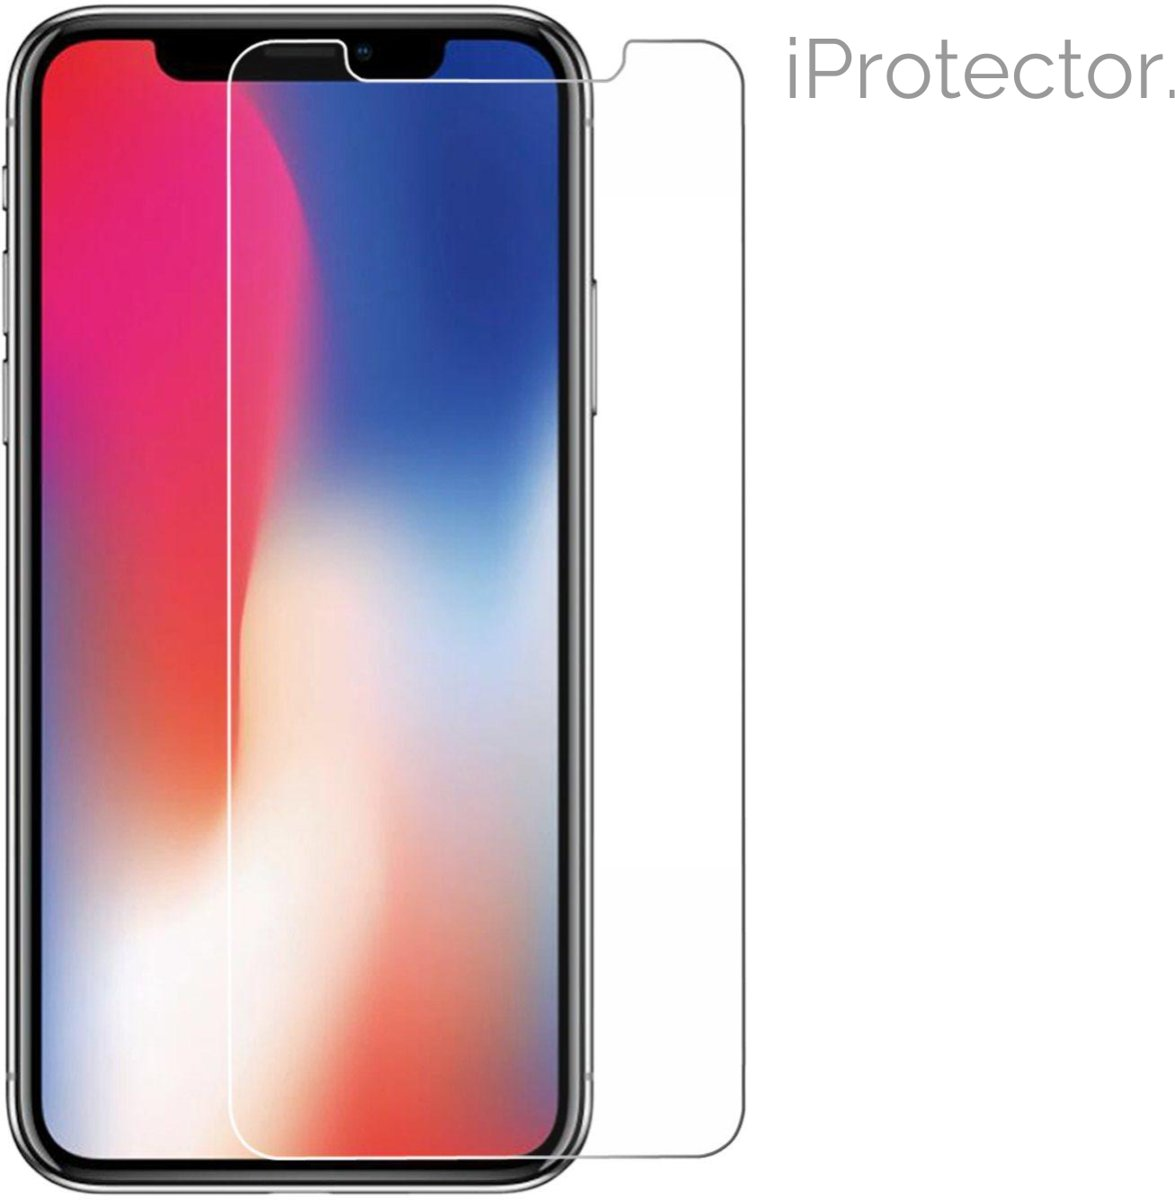 Screen Guard Anti Gores Untuk Blackberry Q10 Clear Daftar Harga Tempered Glass Premium Protector 9h Samsung J3 Pro Free I Ringclear Iphone X Glazen 25d 026mm Iprotector